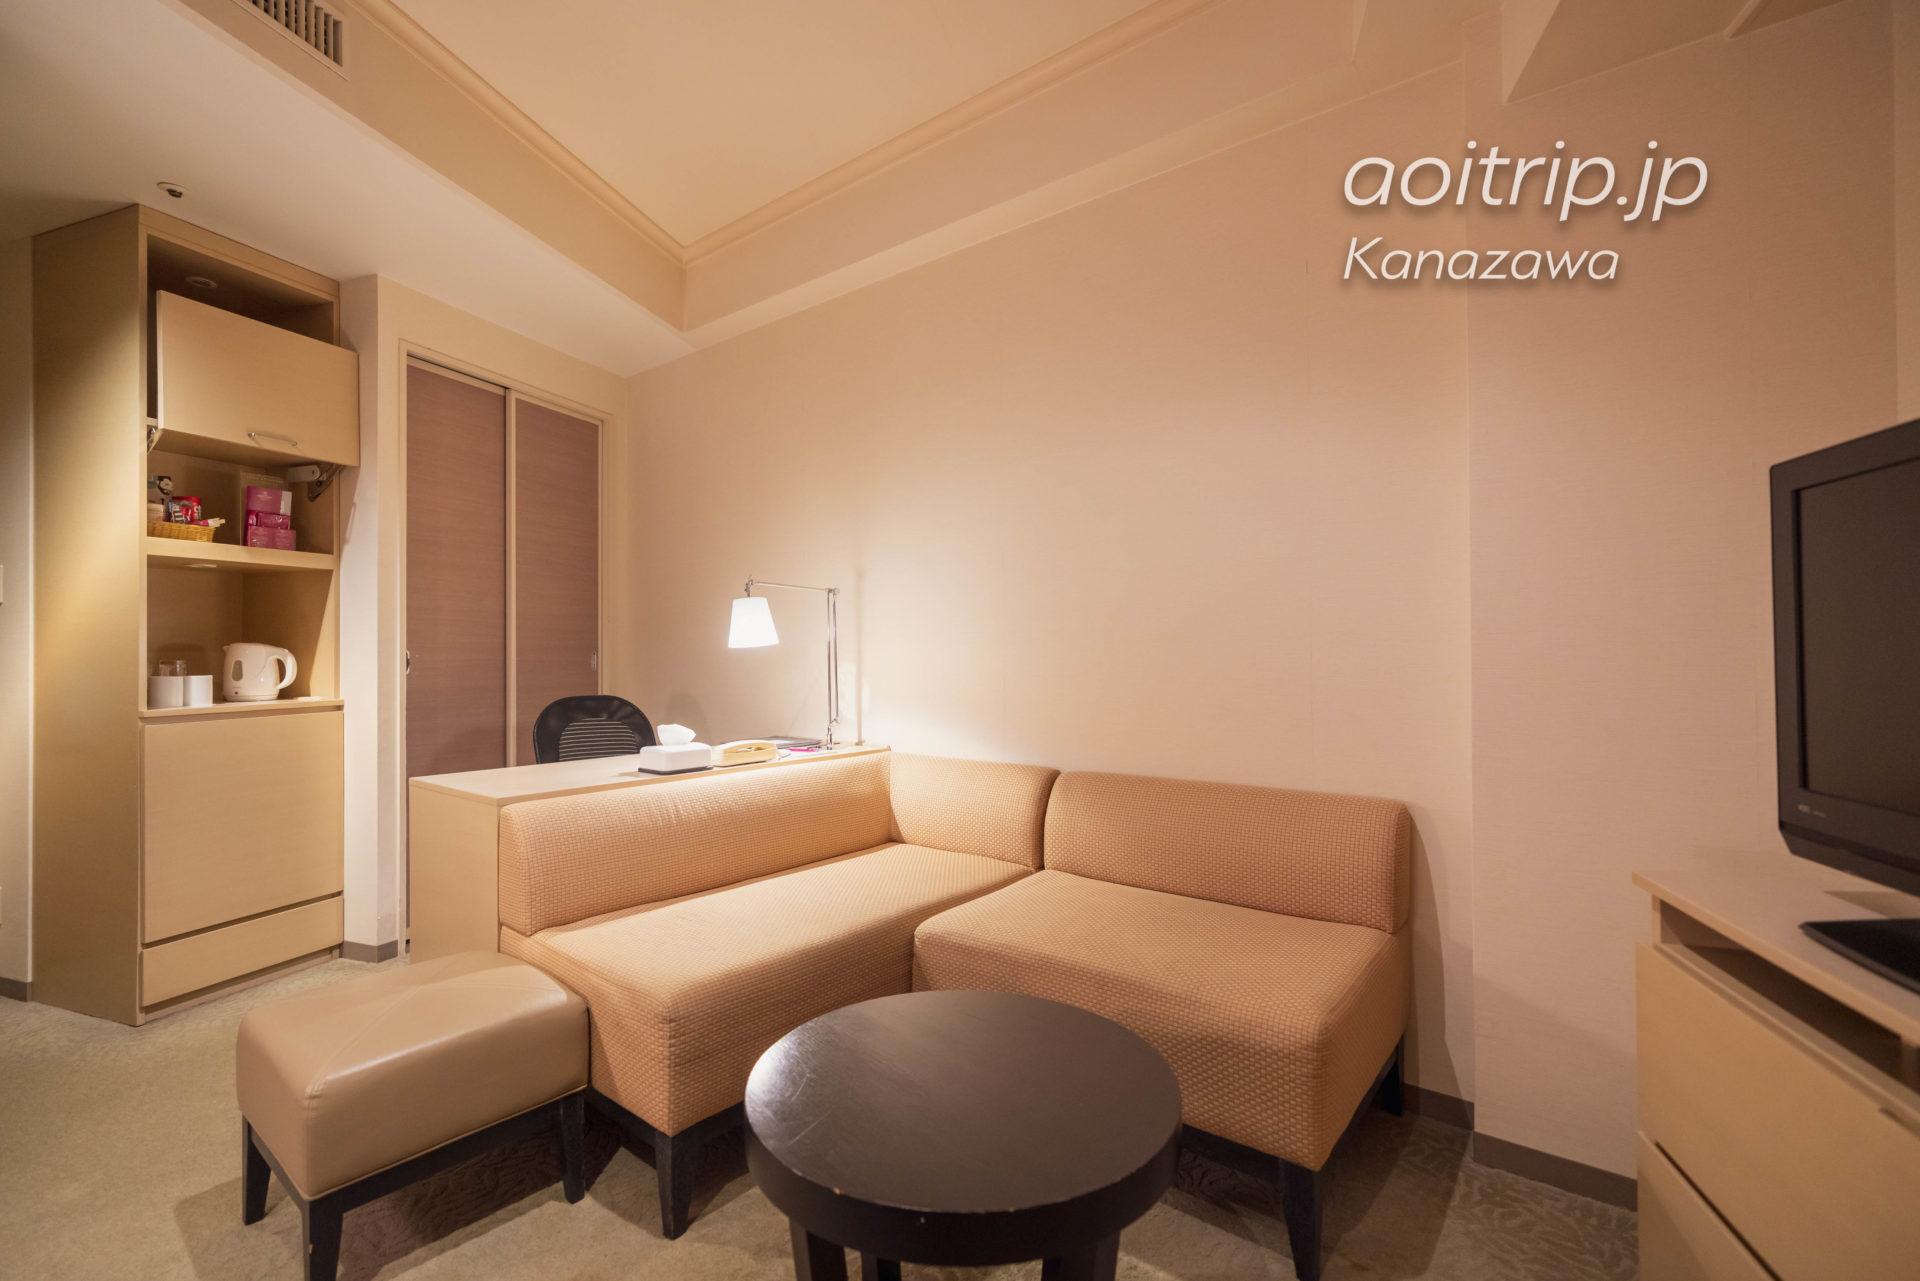 ANAクラウンプラザホテル金沢 ANA Crowne Plaza Hotel Kanazawa スーペリアダブルルーム Superior Double Room